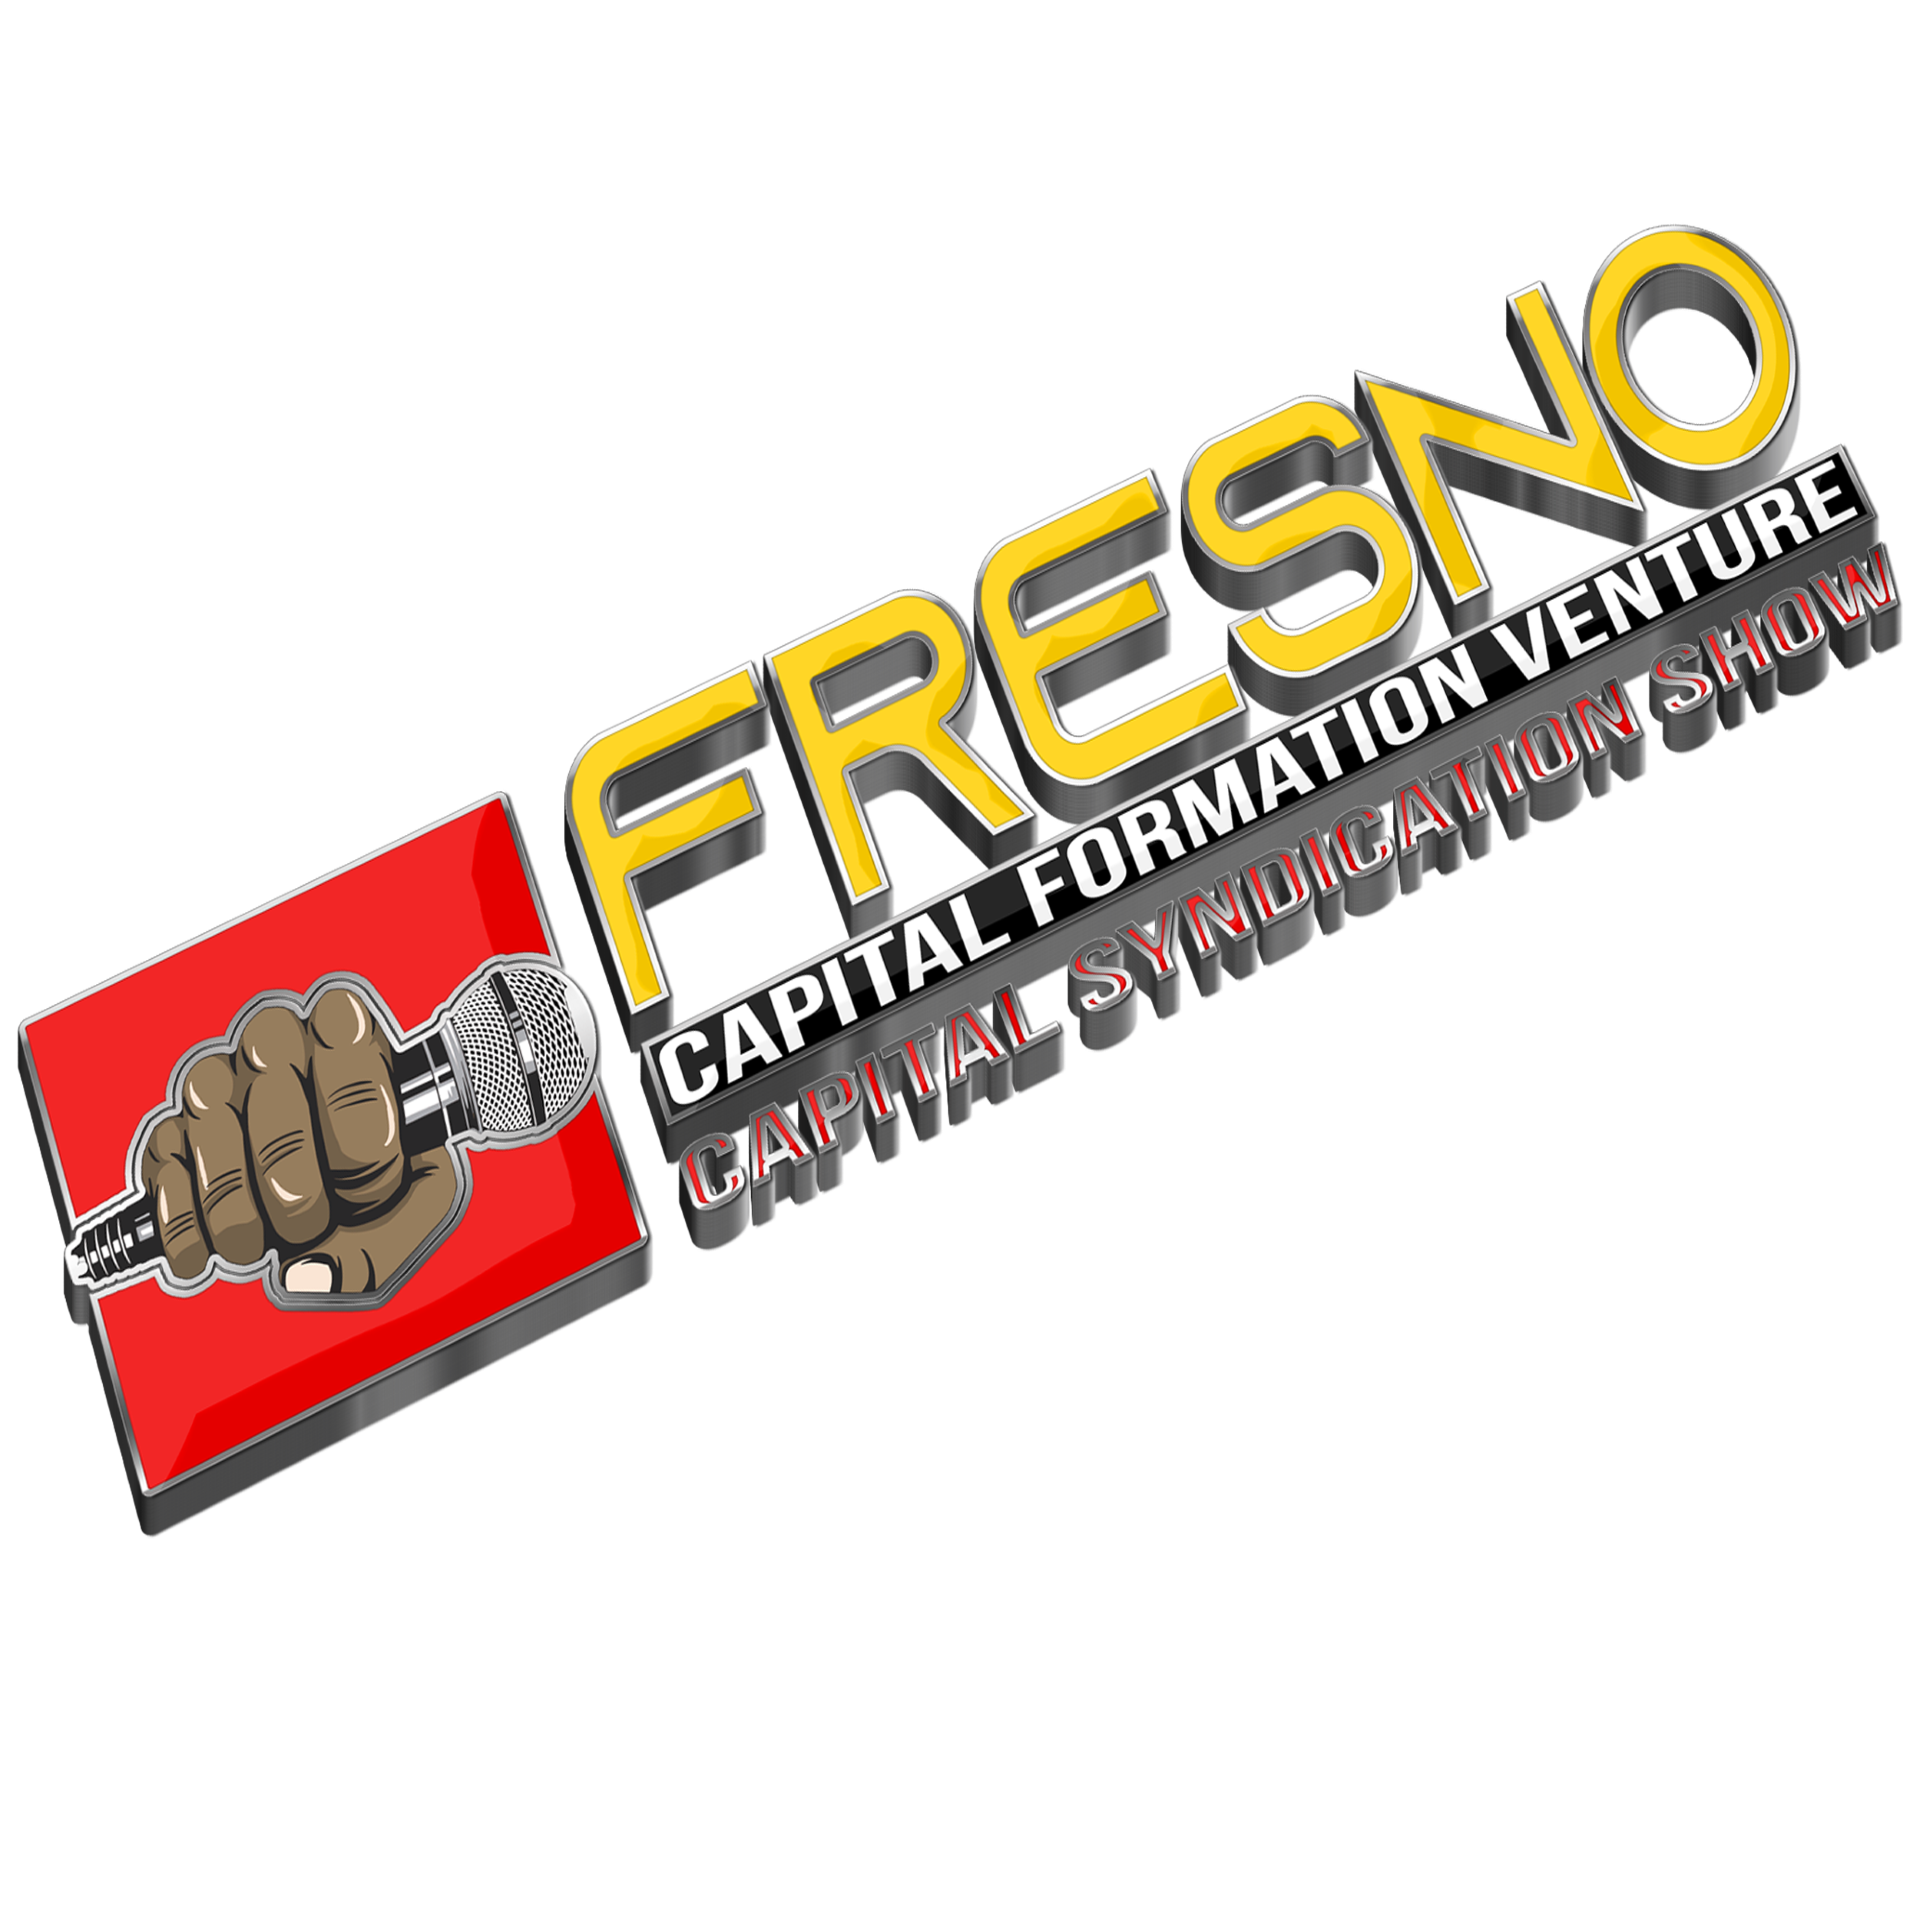 Show artwork for Taxes & Finances Fresno Capital Formation Online Radio